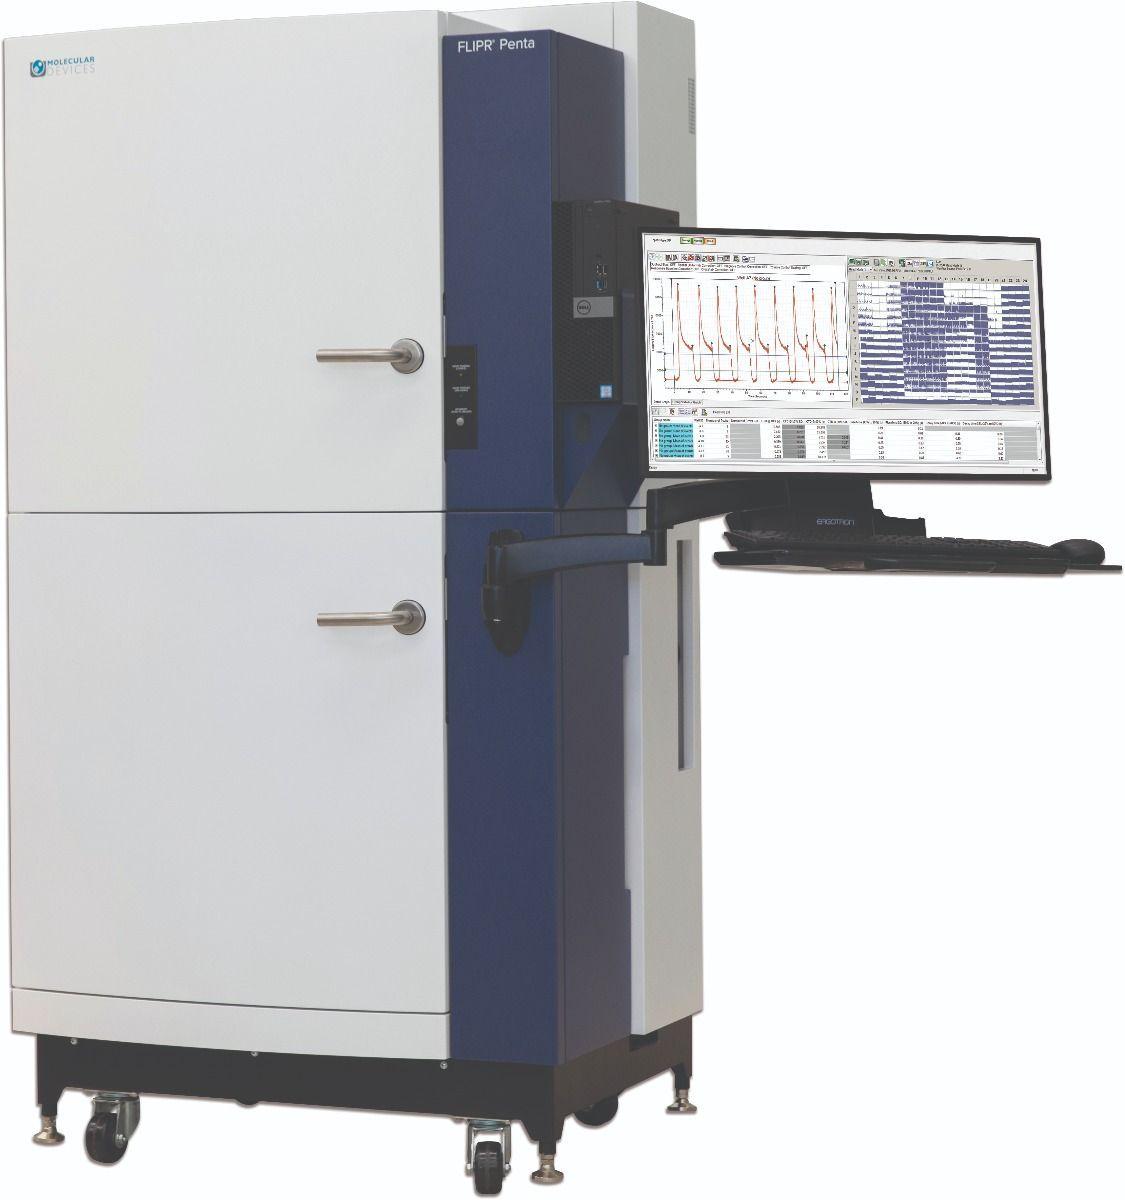 FLIPR Penta High-Throughput Cellular Screening System